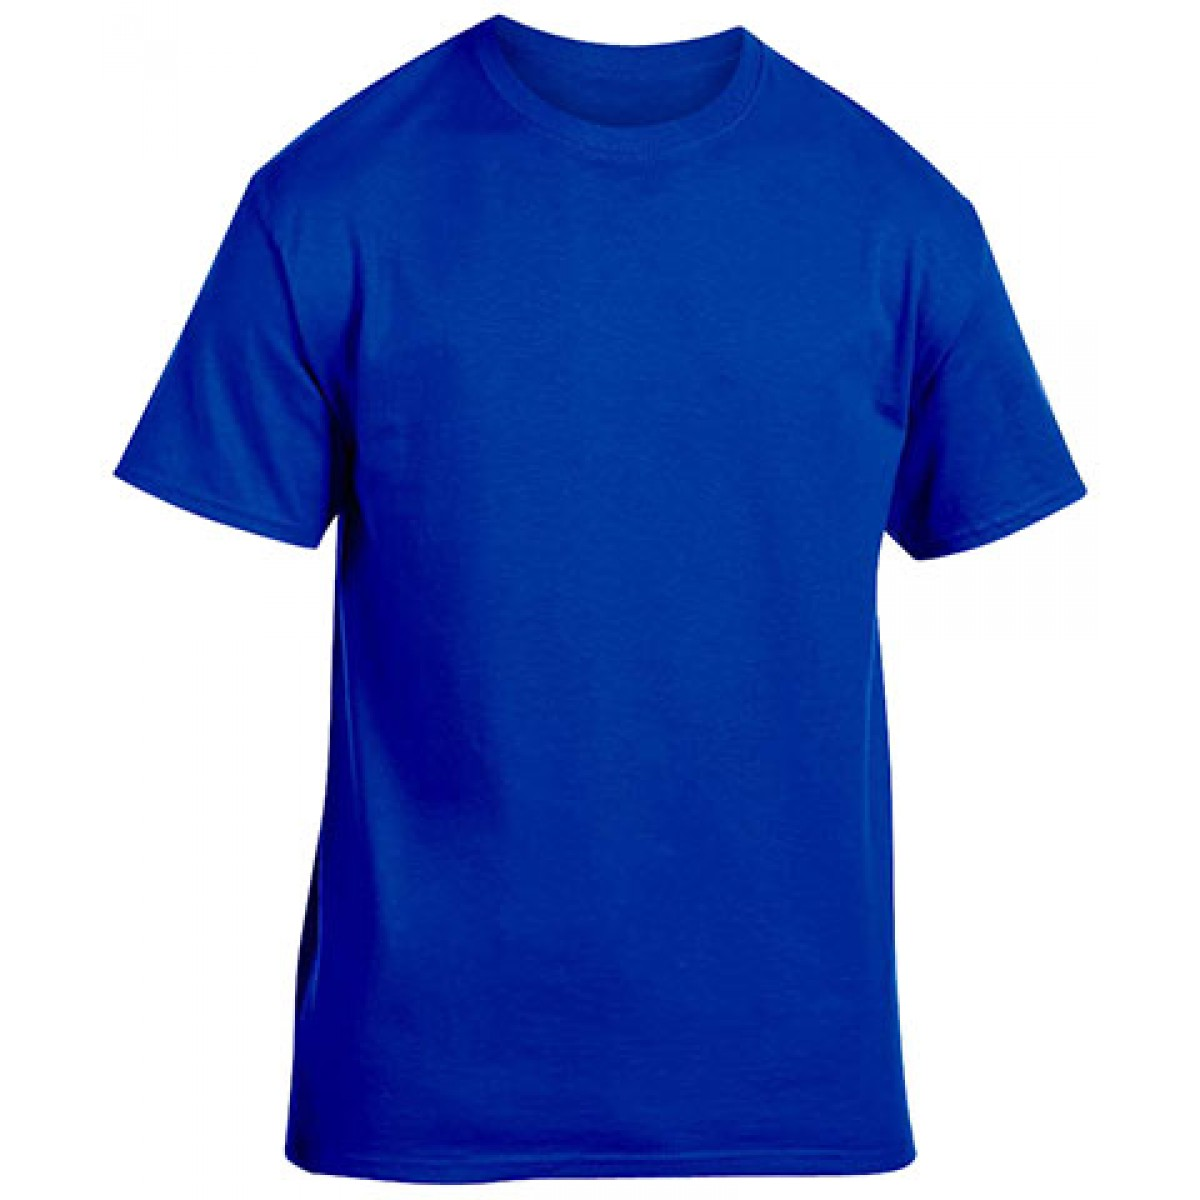 Heavy Cotton Activewear T-Shirt-Royal Blue-2XL